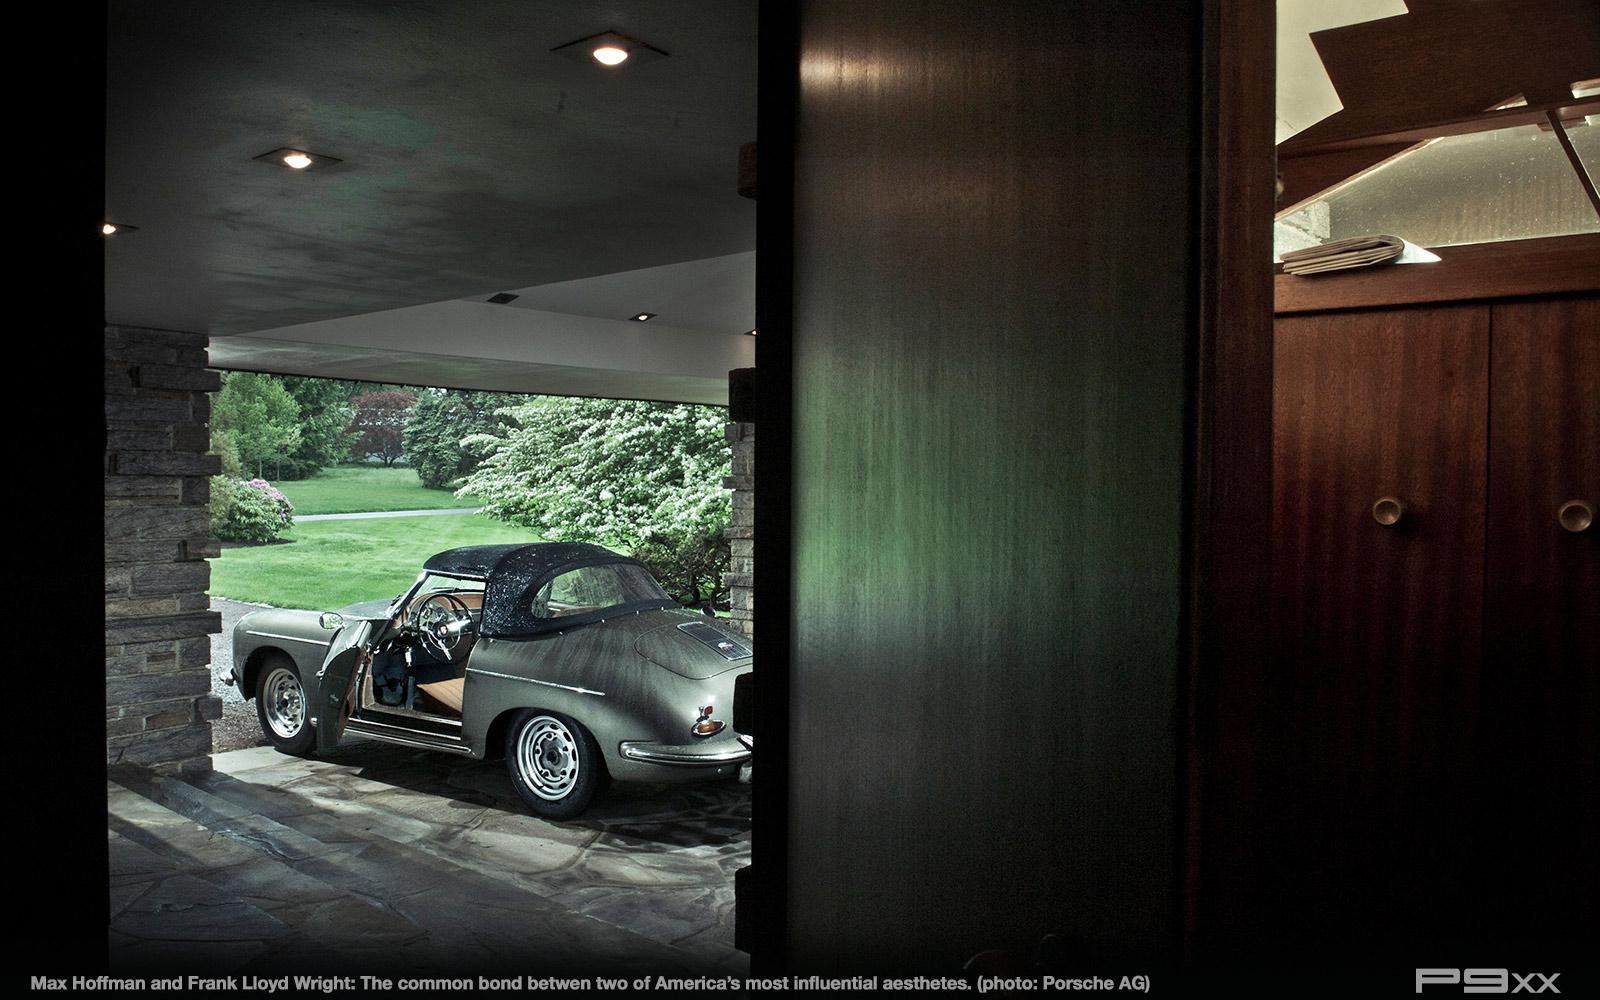 Max-Hoffman-Frank-Lloyd-Wright-Porsche-356-330